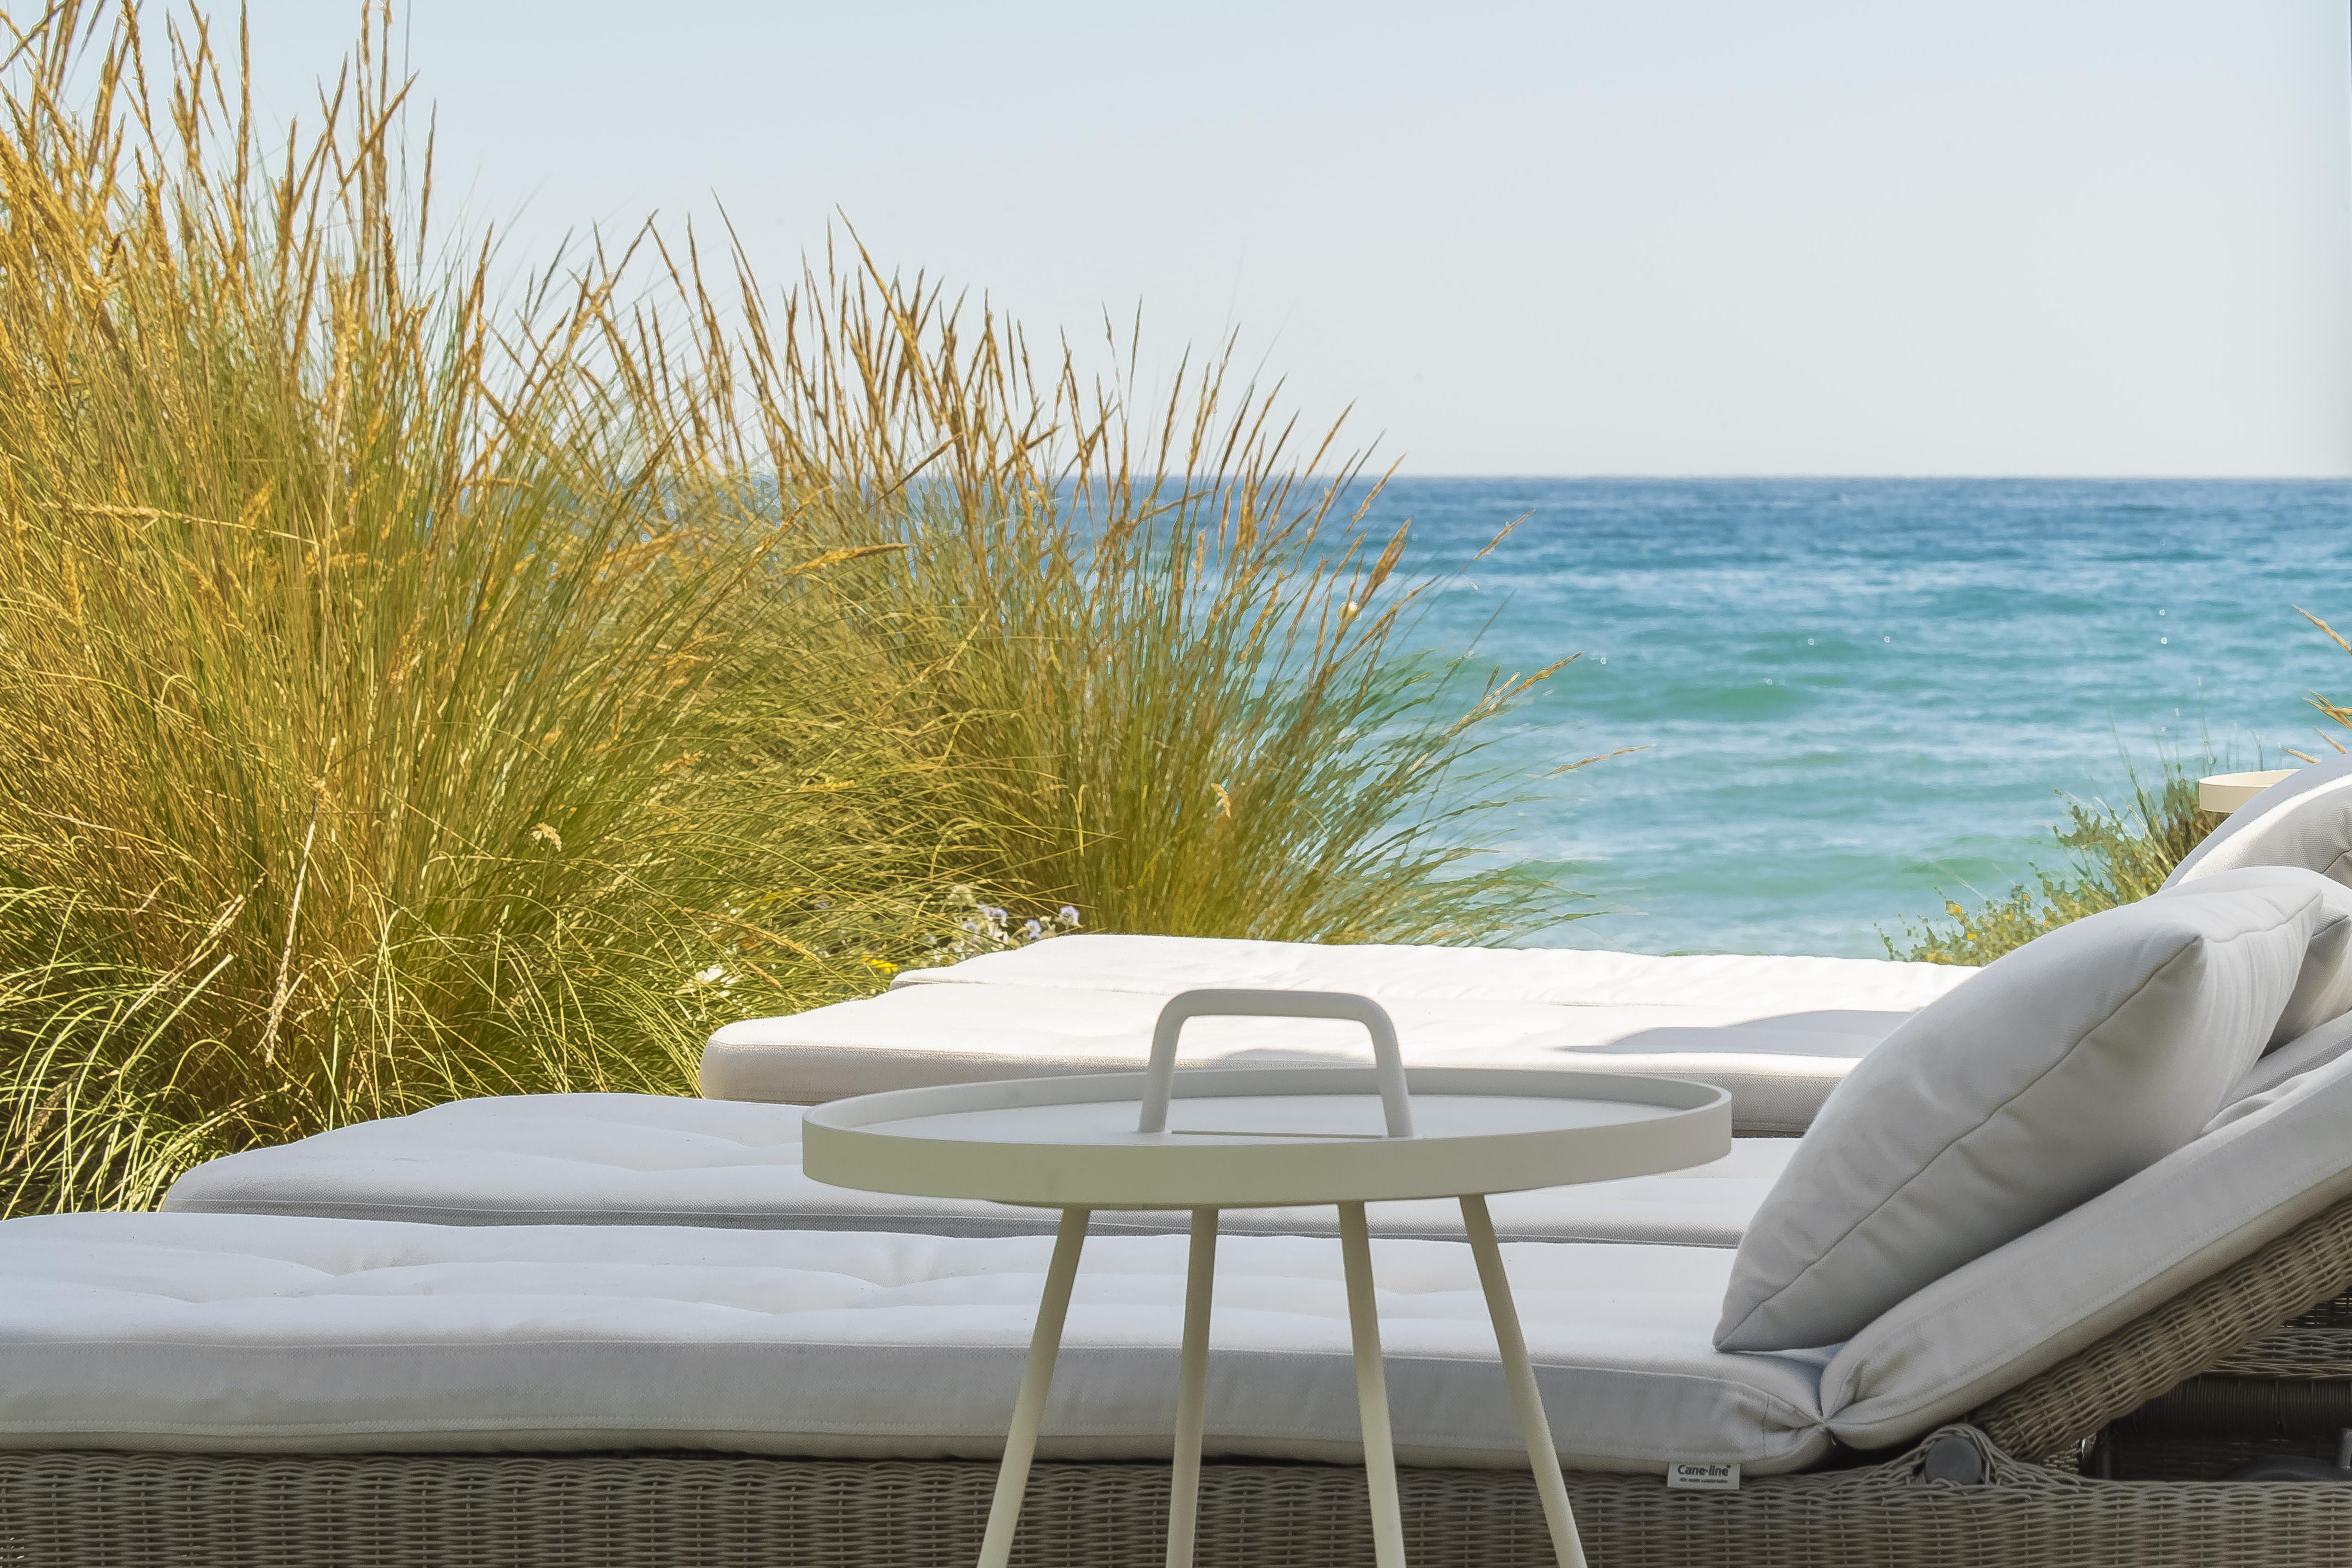 Costabella Beachfront, Villa available for Holiday Rental in Las Chapas, Marbella, Spain